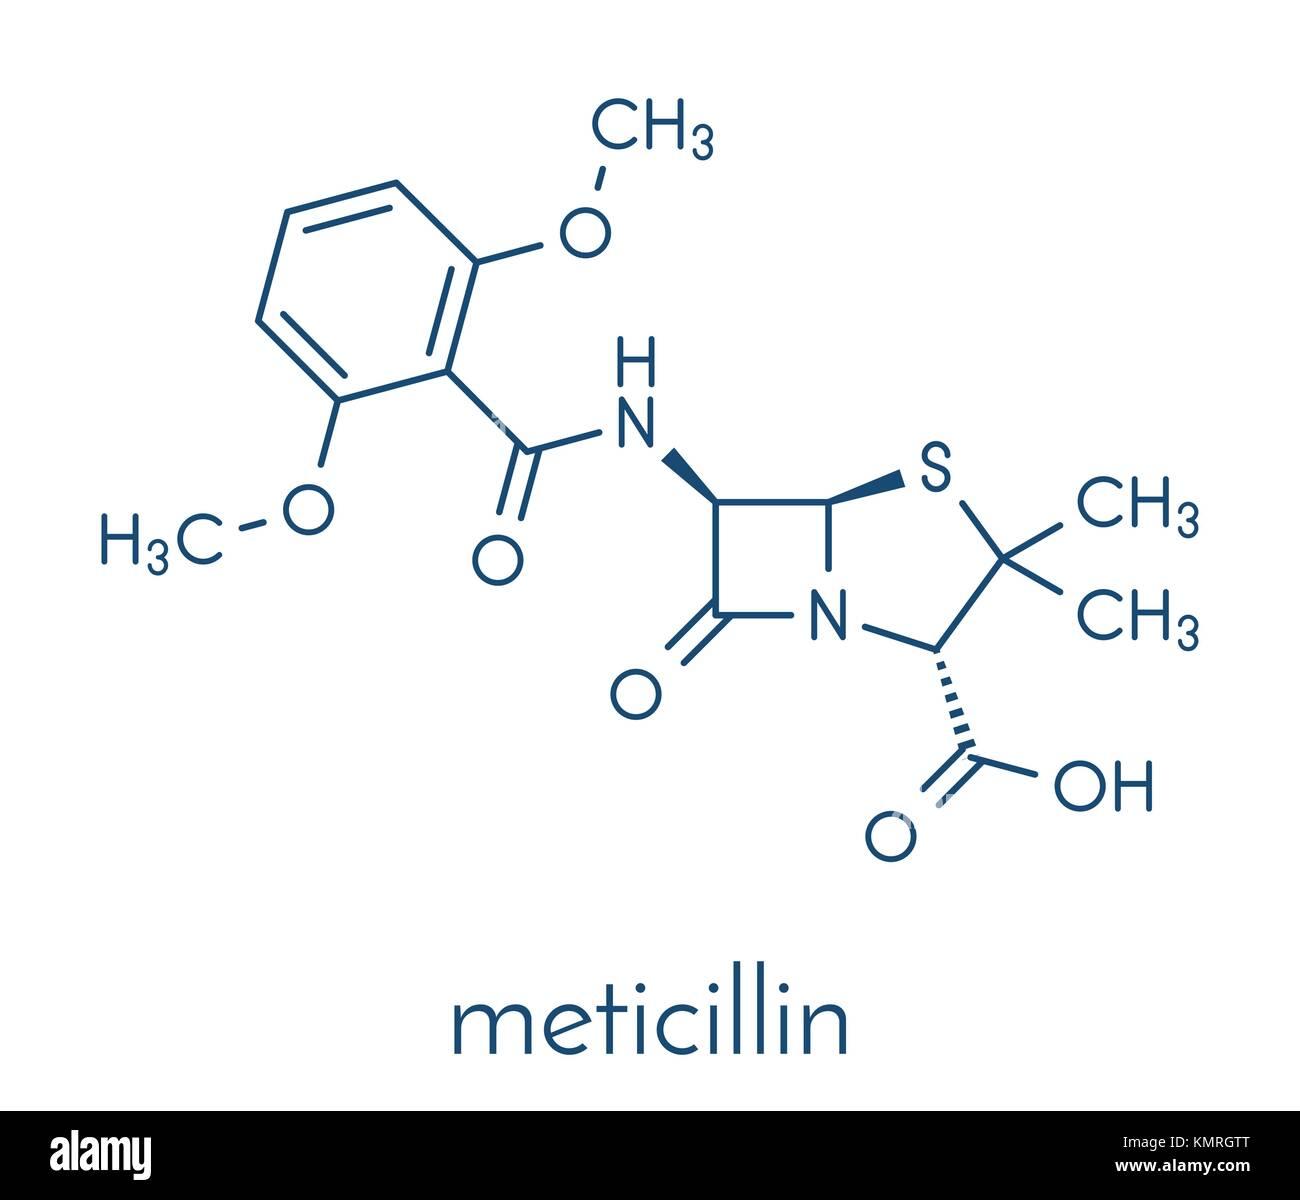 1aca96239901 Meticillin farmaci antibiotici (beta-lattamici classe) molecola. mrsa è  sinonimo di Staphylococcus aureus resistente alla meticillina. formula  scheletrico.